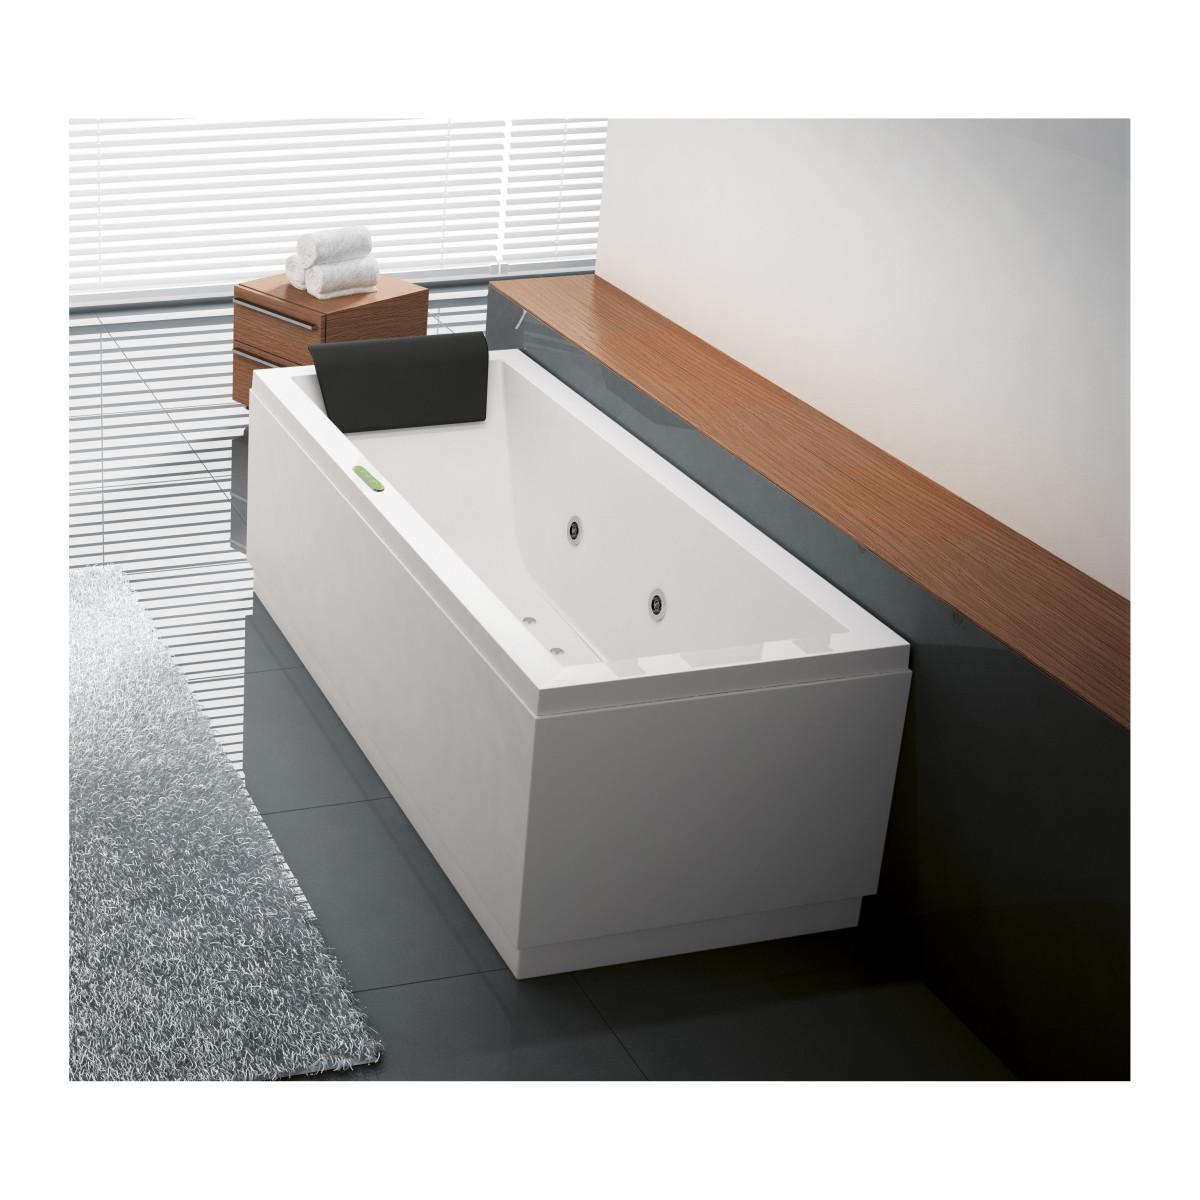 Vasca idromassaggio amea 180 x 80 cm prezzi e offerte online - Vasca da bagno leroy merlin ...